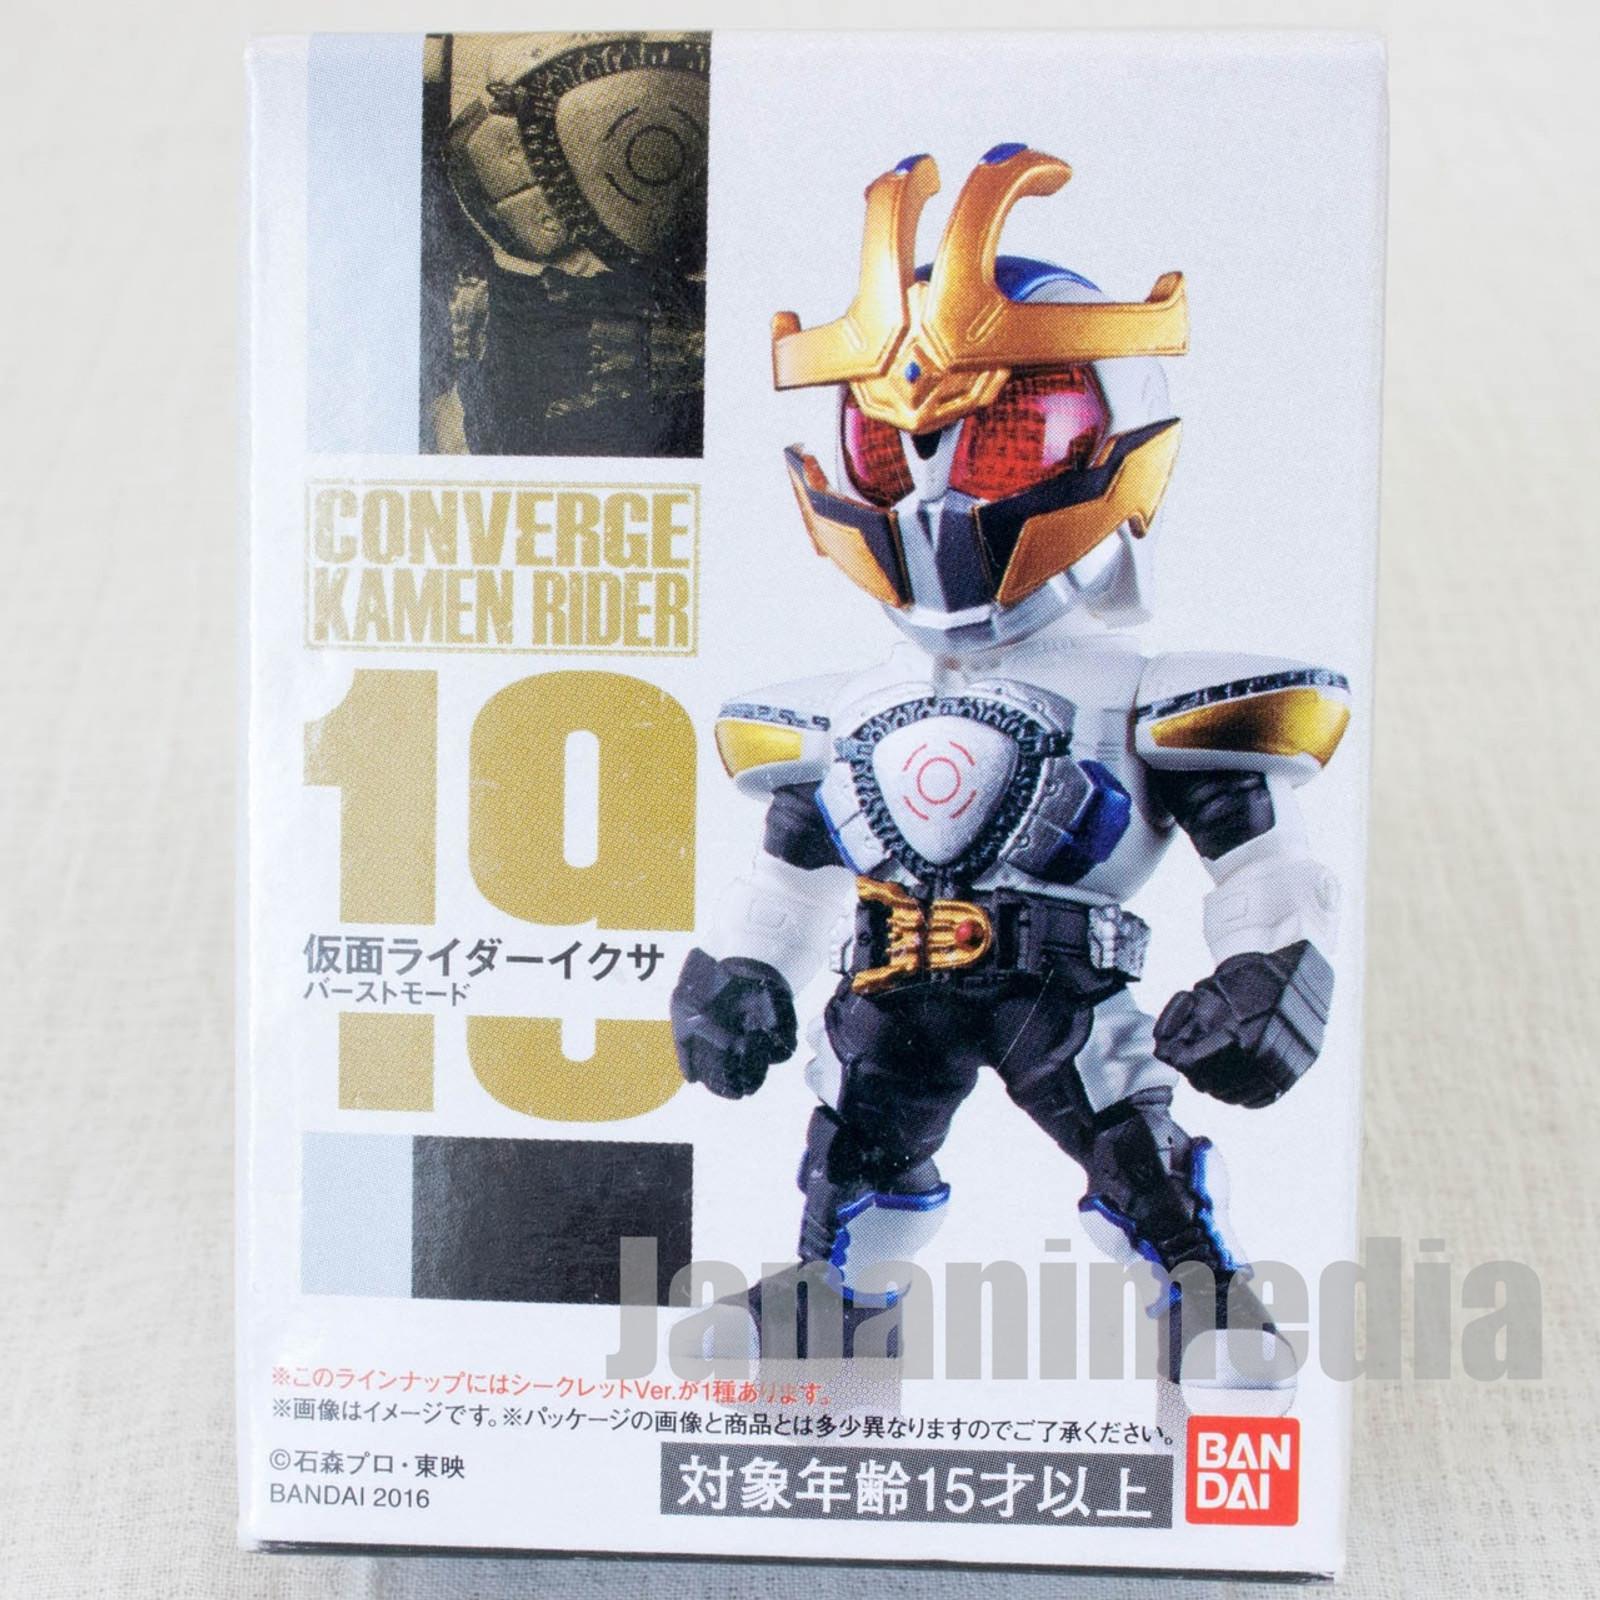 Kamen Rider Ixa Converge Kamen Rider #19 Burst mode Mini Figure Bandai JAPAN TOKUSATSU